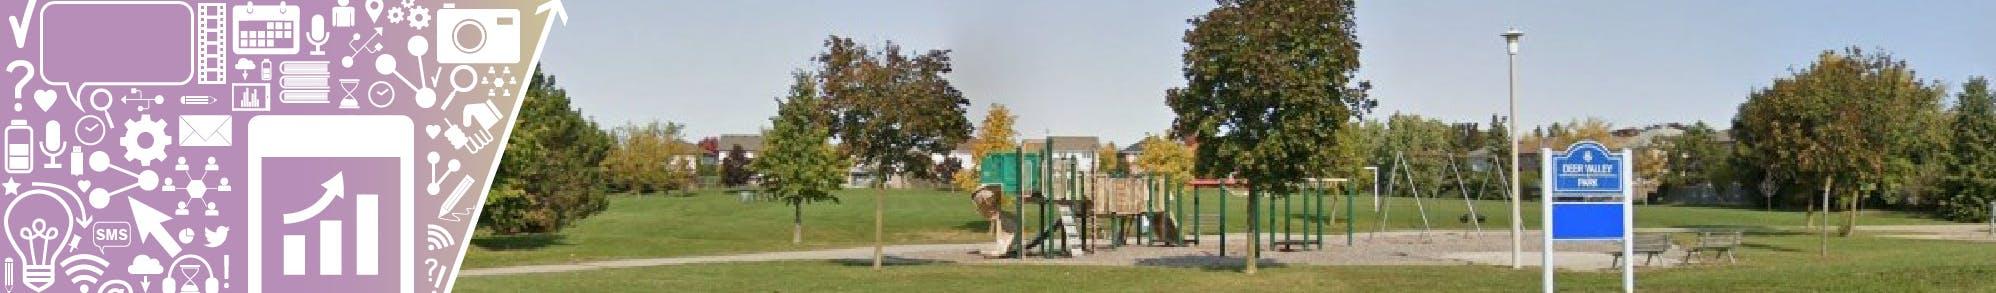 Deer Valley Park Redevelopment Banner